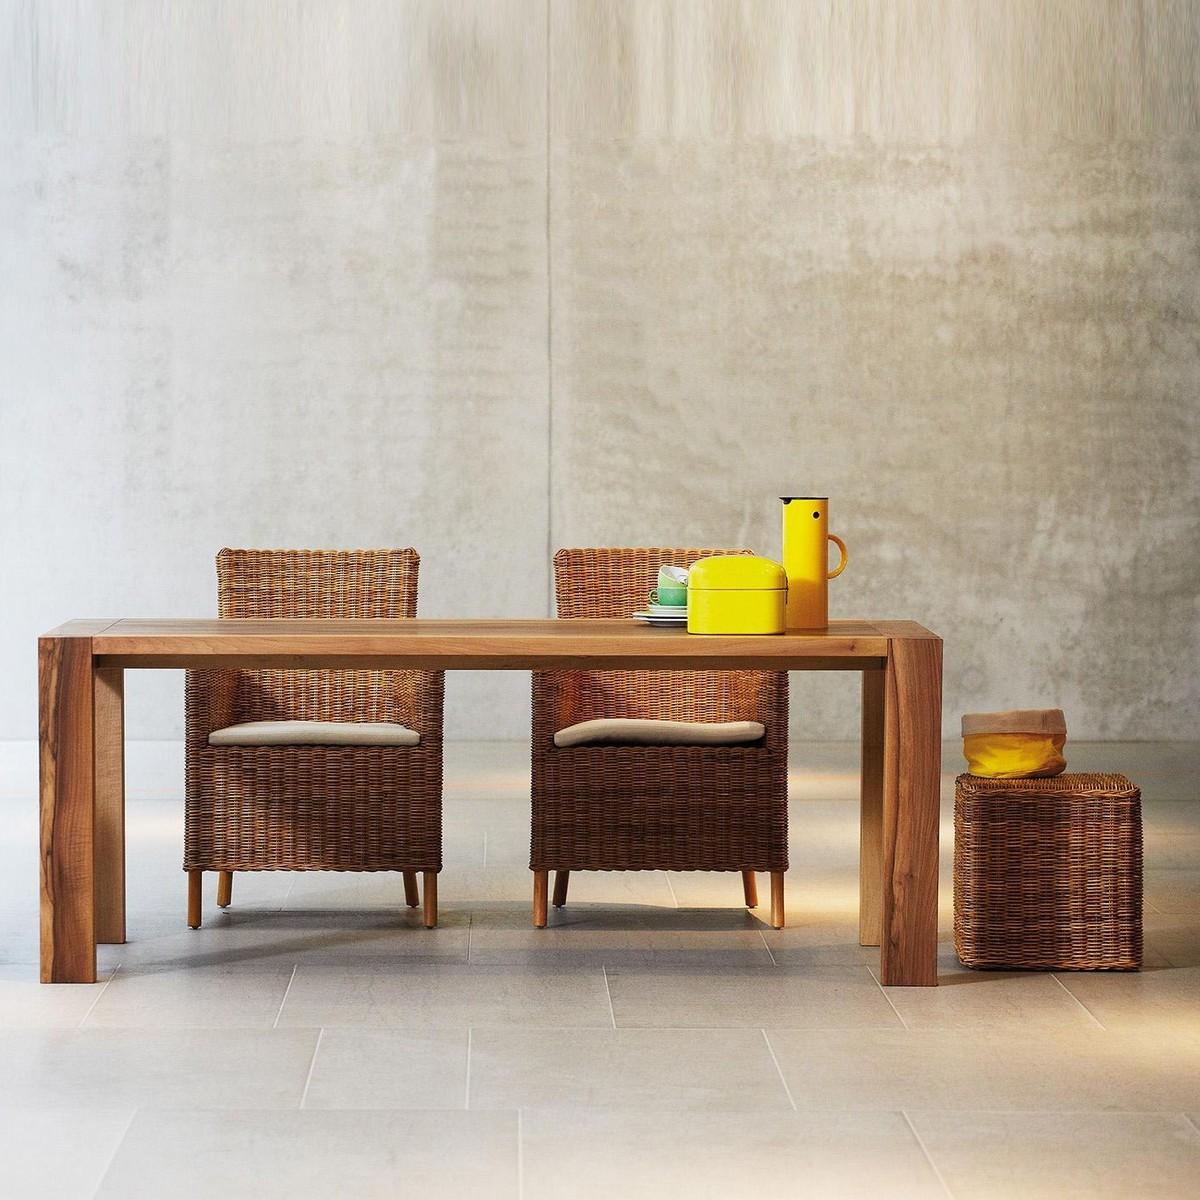 yoba naturrattan hocker jan kurtz. Black Bedroom Furniture Sets. Home Design Ideas